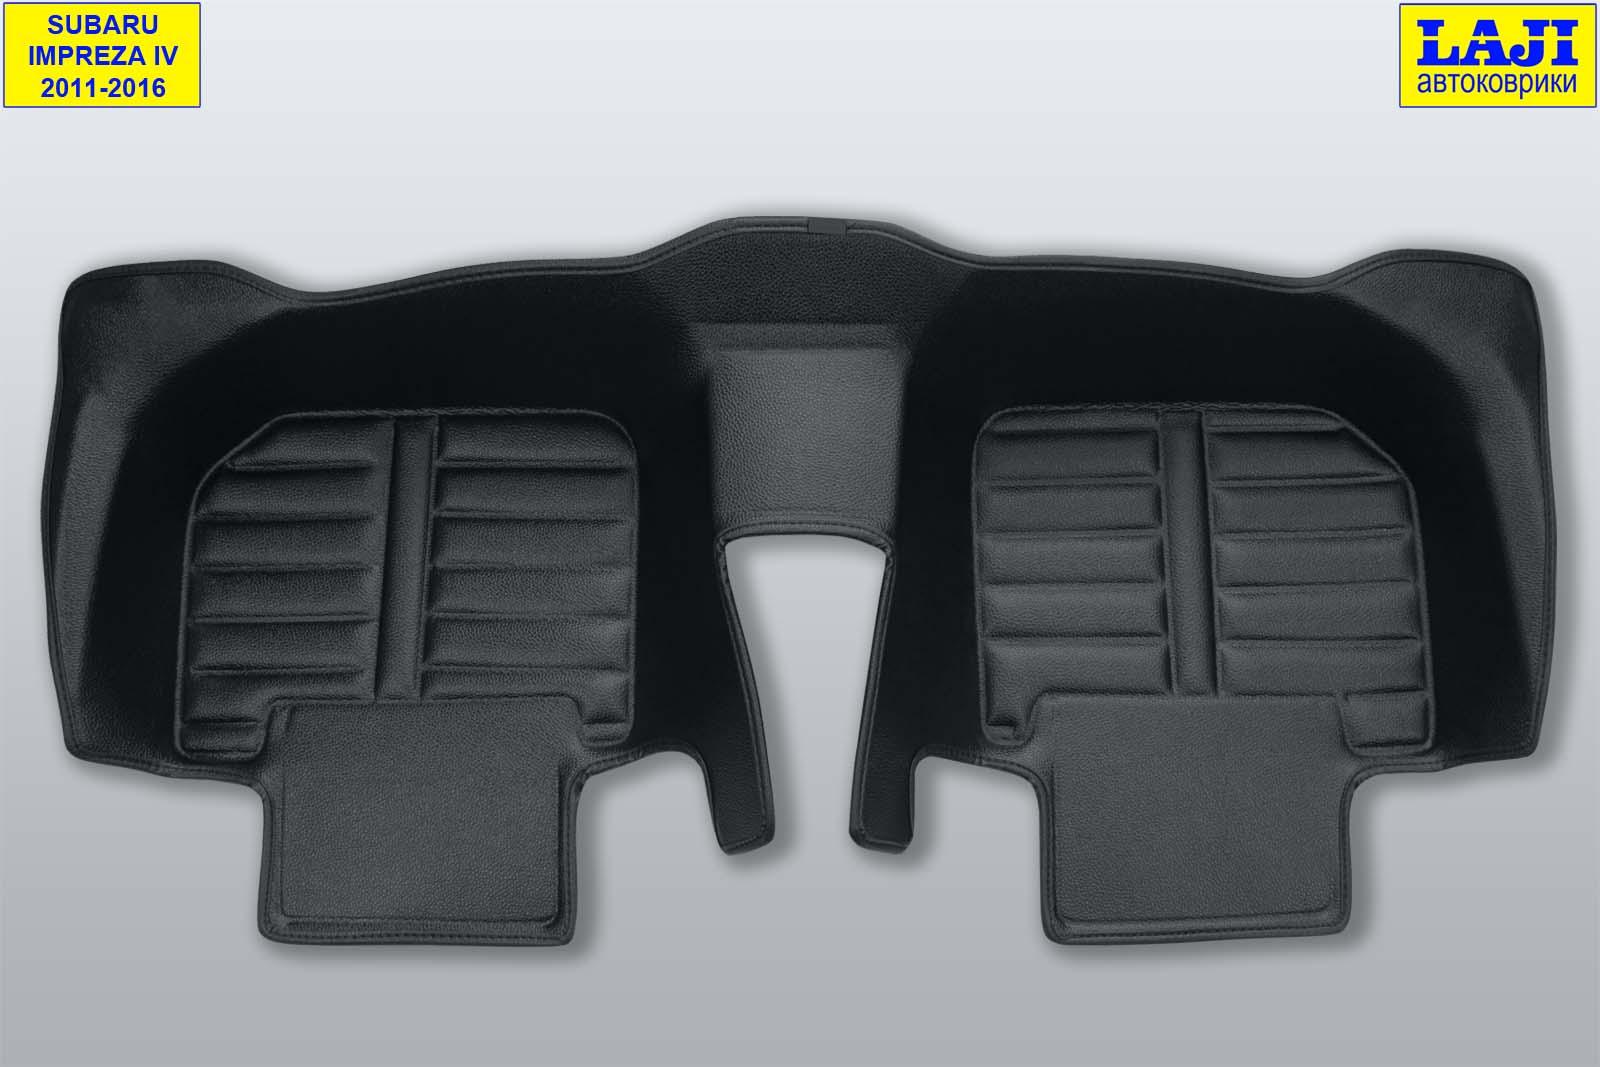 5D коврики в салон Subaru Impreza 4 2011-2016 9